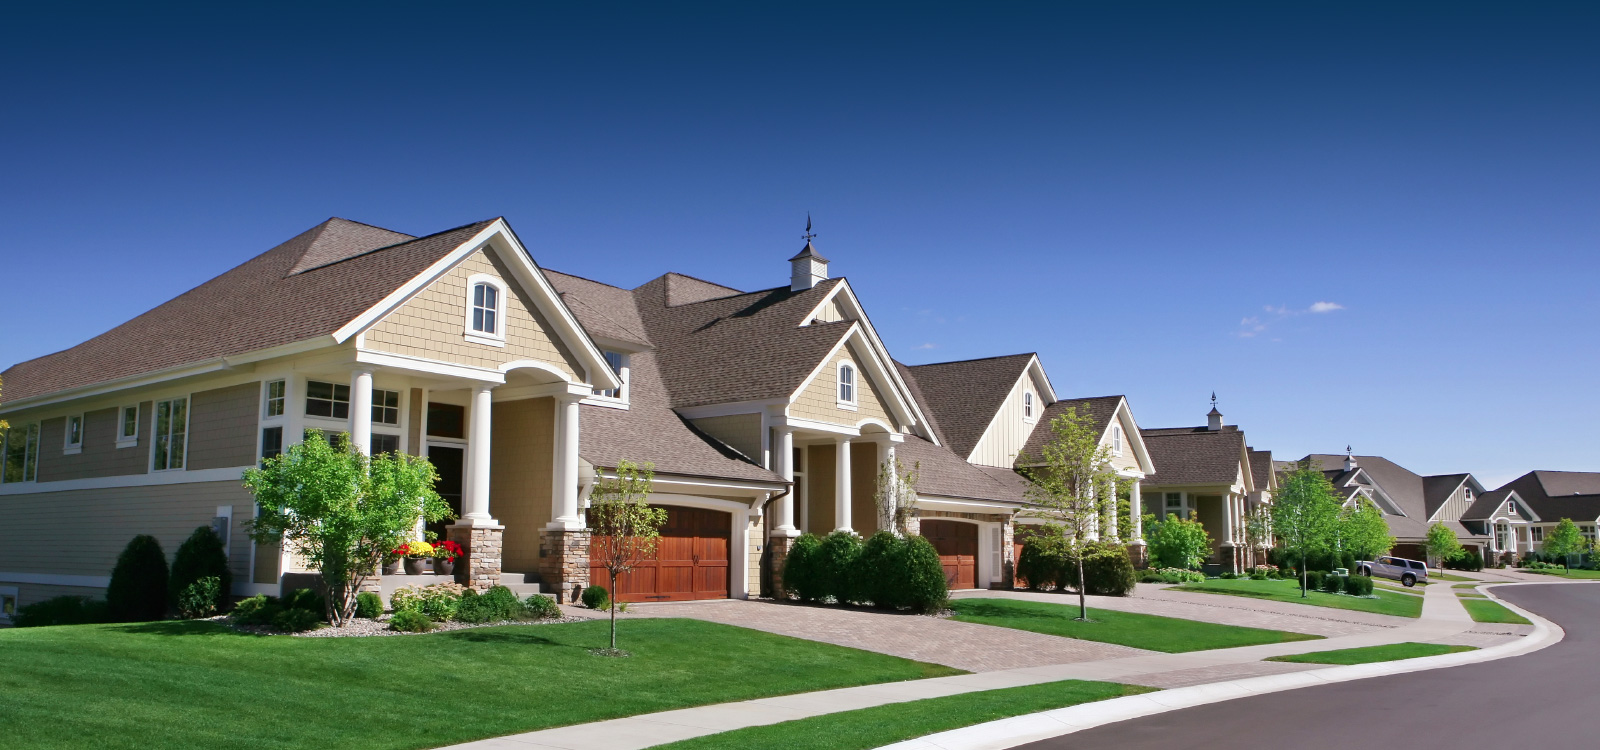 Home Inspection Checklist St Louis